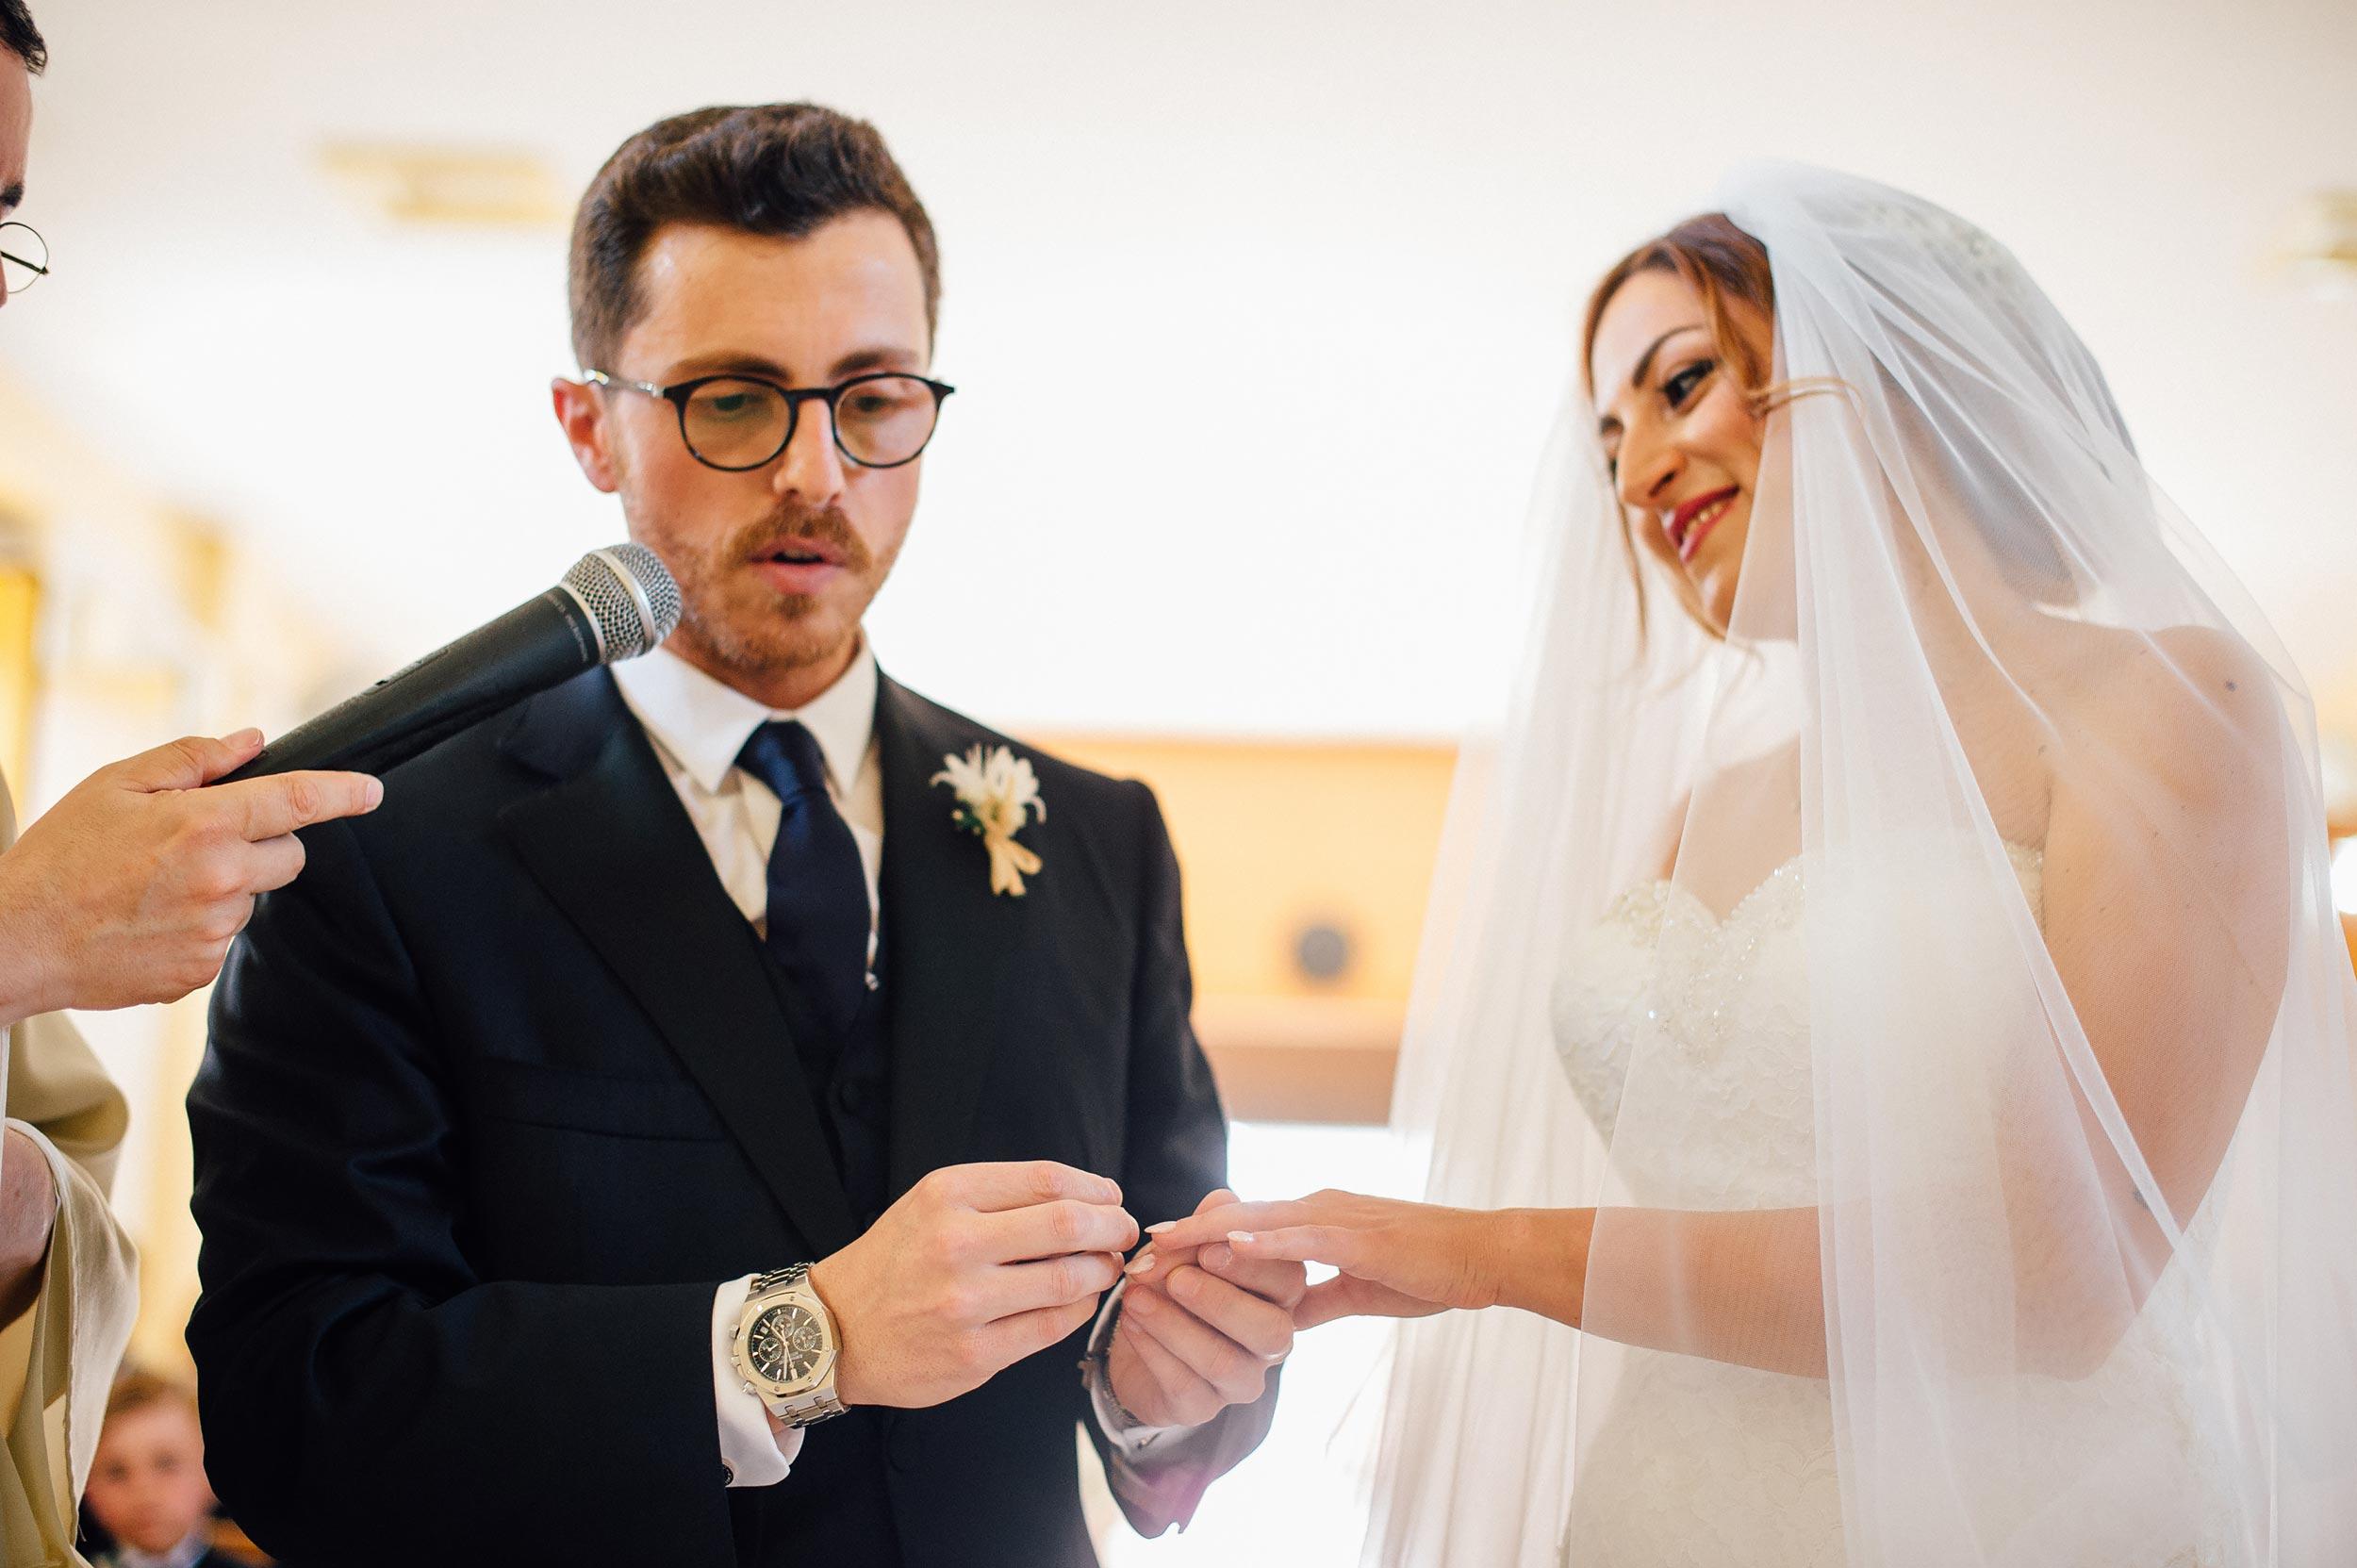 2016-Claudio-Teresa-Naples-Wedding-Photographer-Italy-Alessandro-Avenali-48.jpg